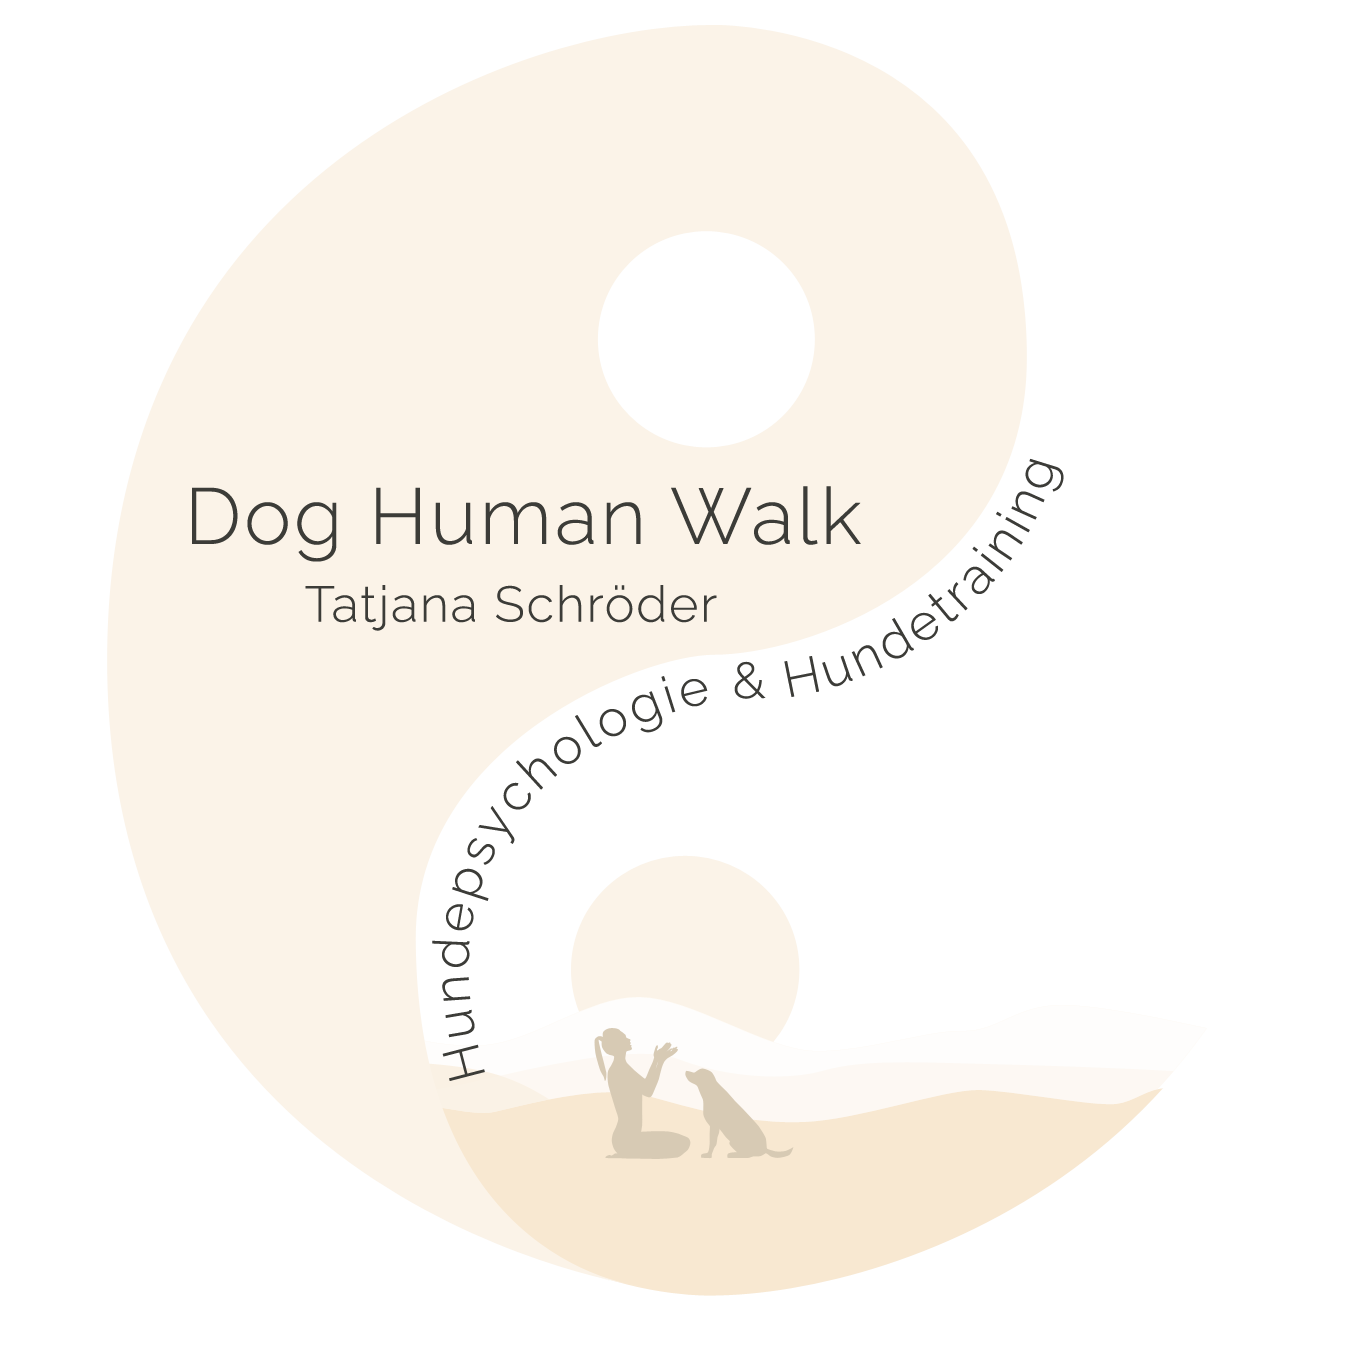 Dog Human Walk Logo Hundeschule Hundepsychologie Hundeverhaltensberatung Bitburg Trier Wittlich